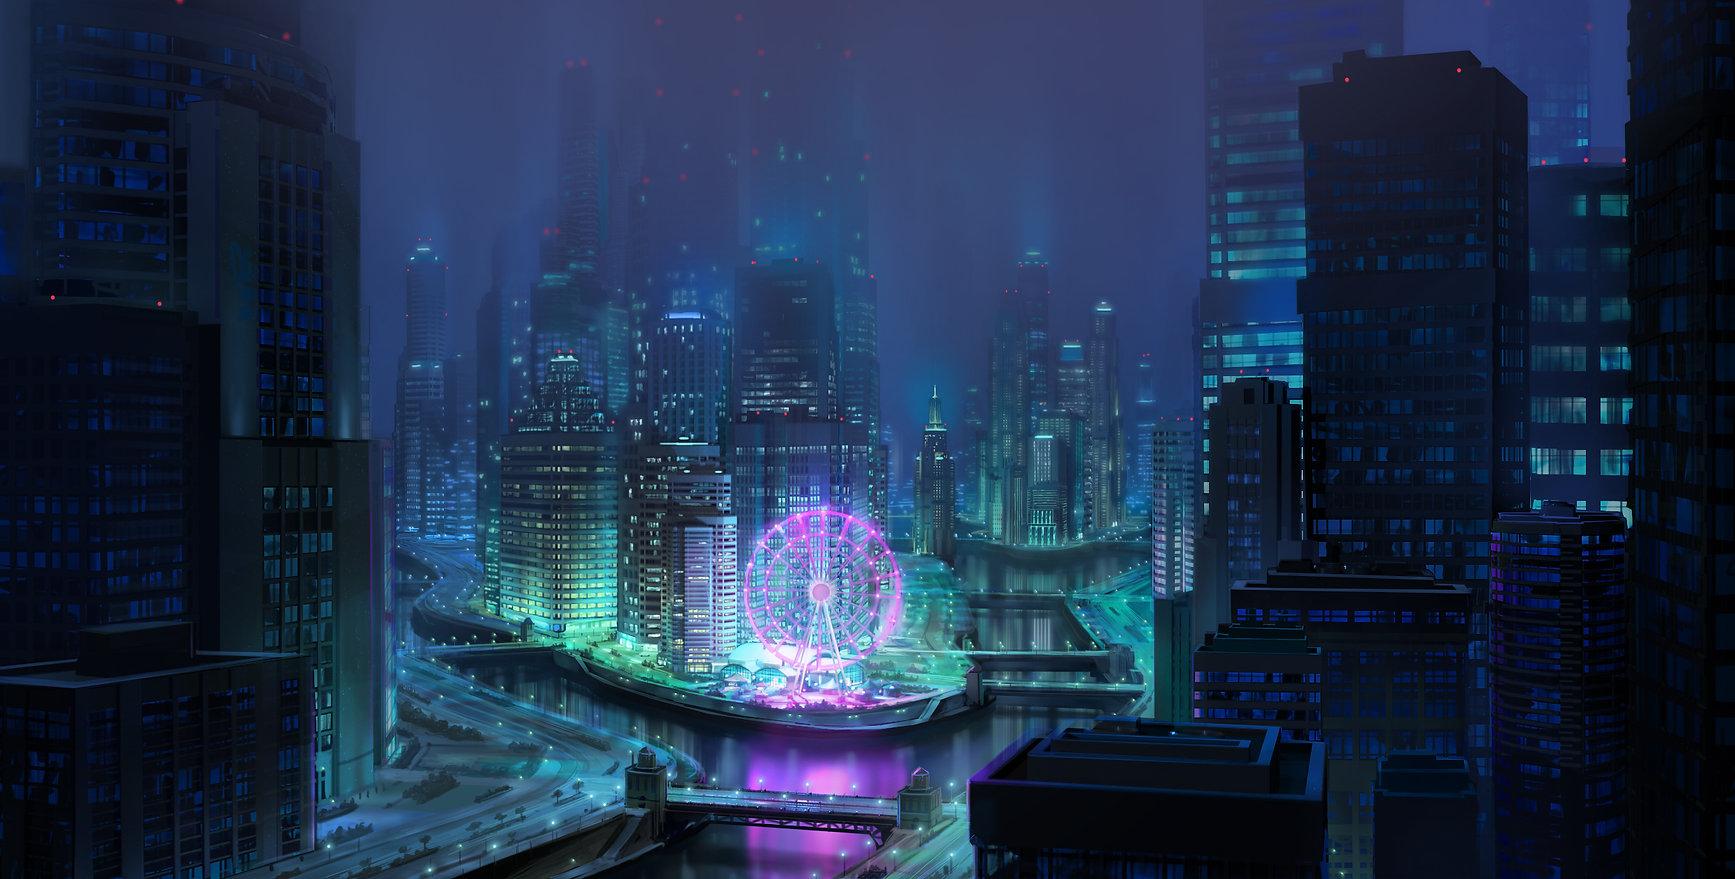 Gotham_City.jpg